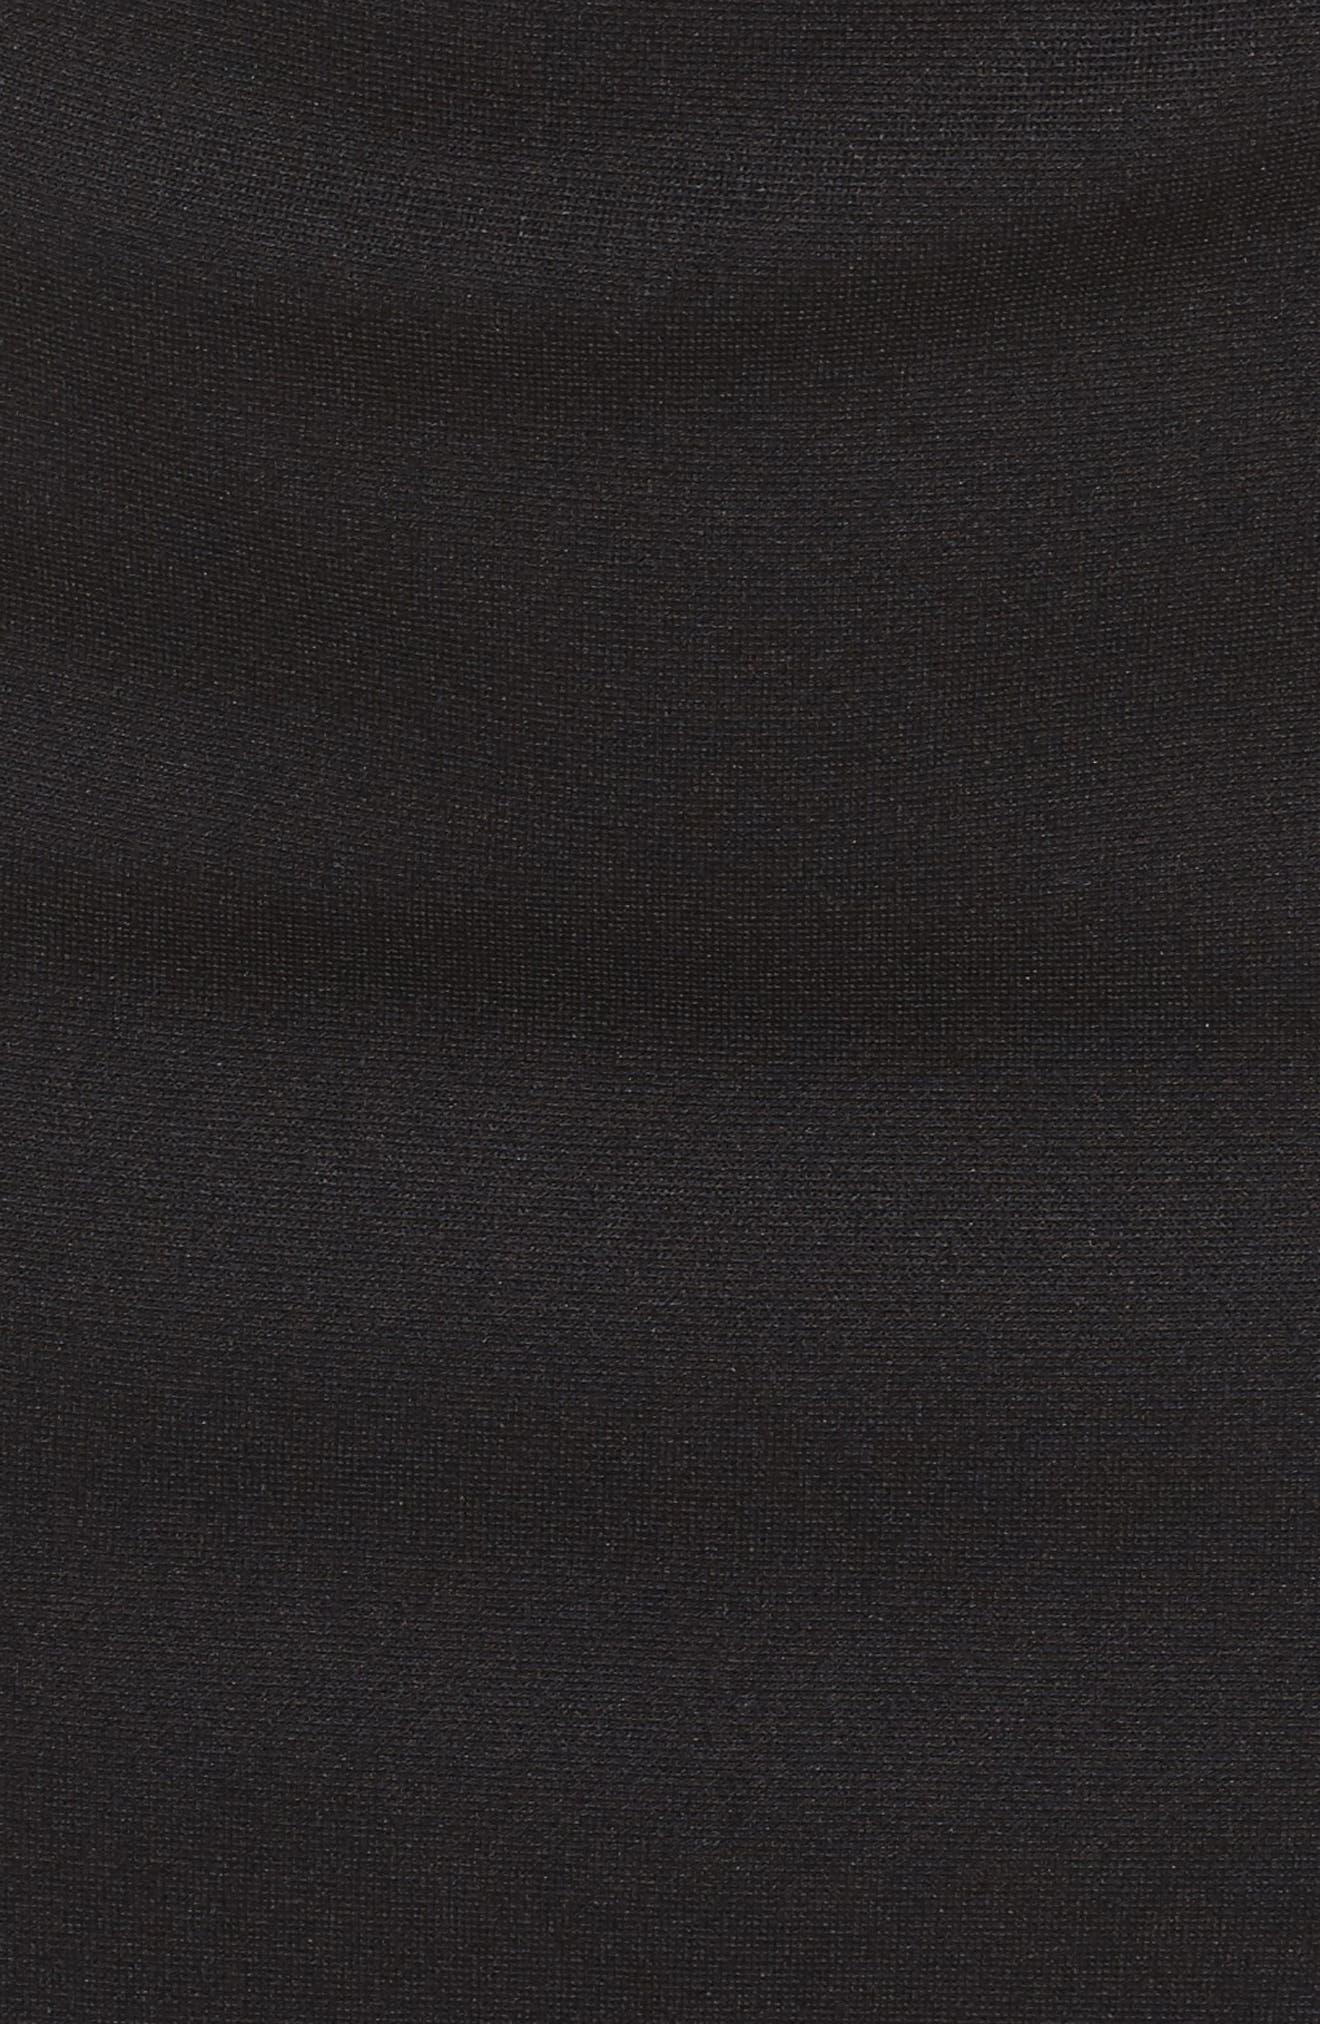 Micro Ottoman Lace-Up Sheath Dress,                             Alternate thumbnail 5, color,                             001